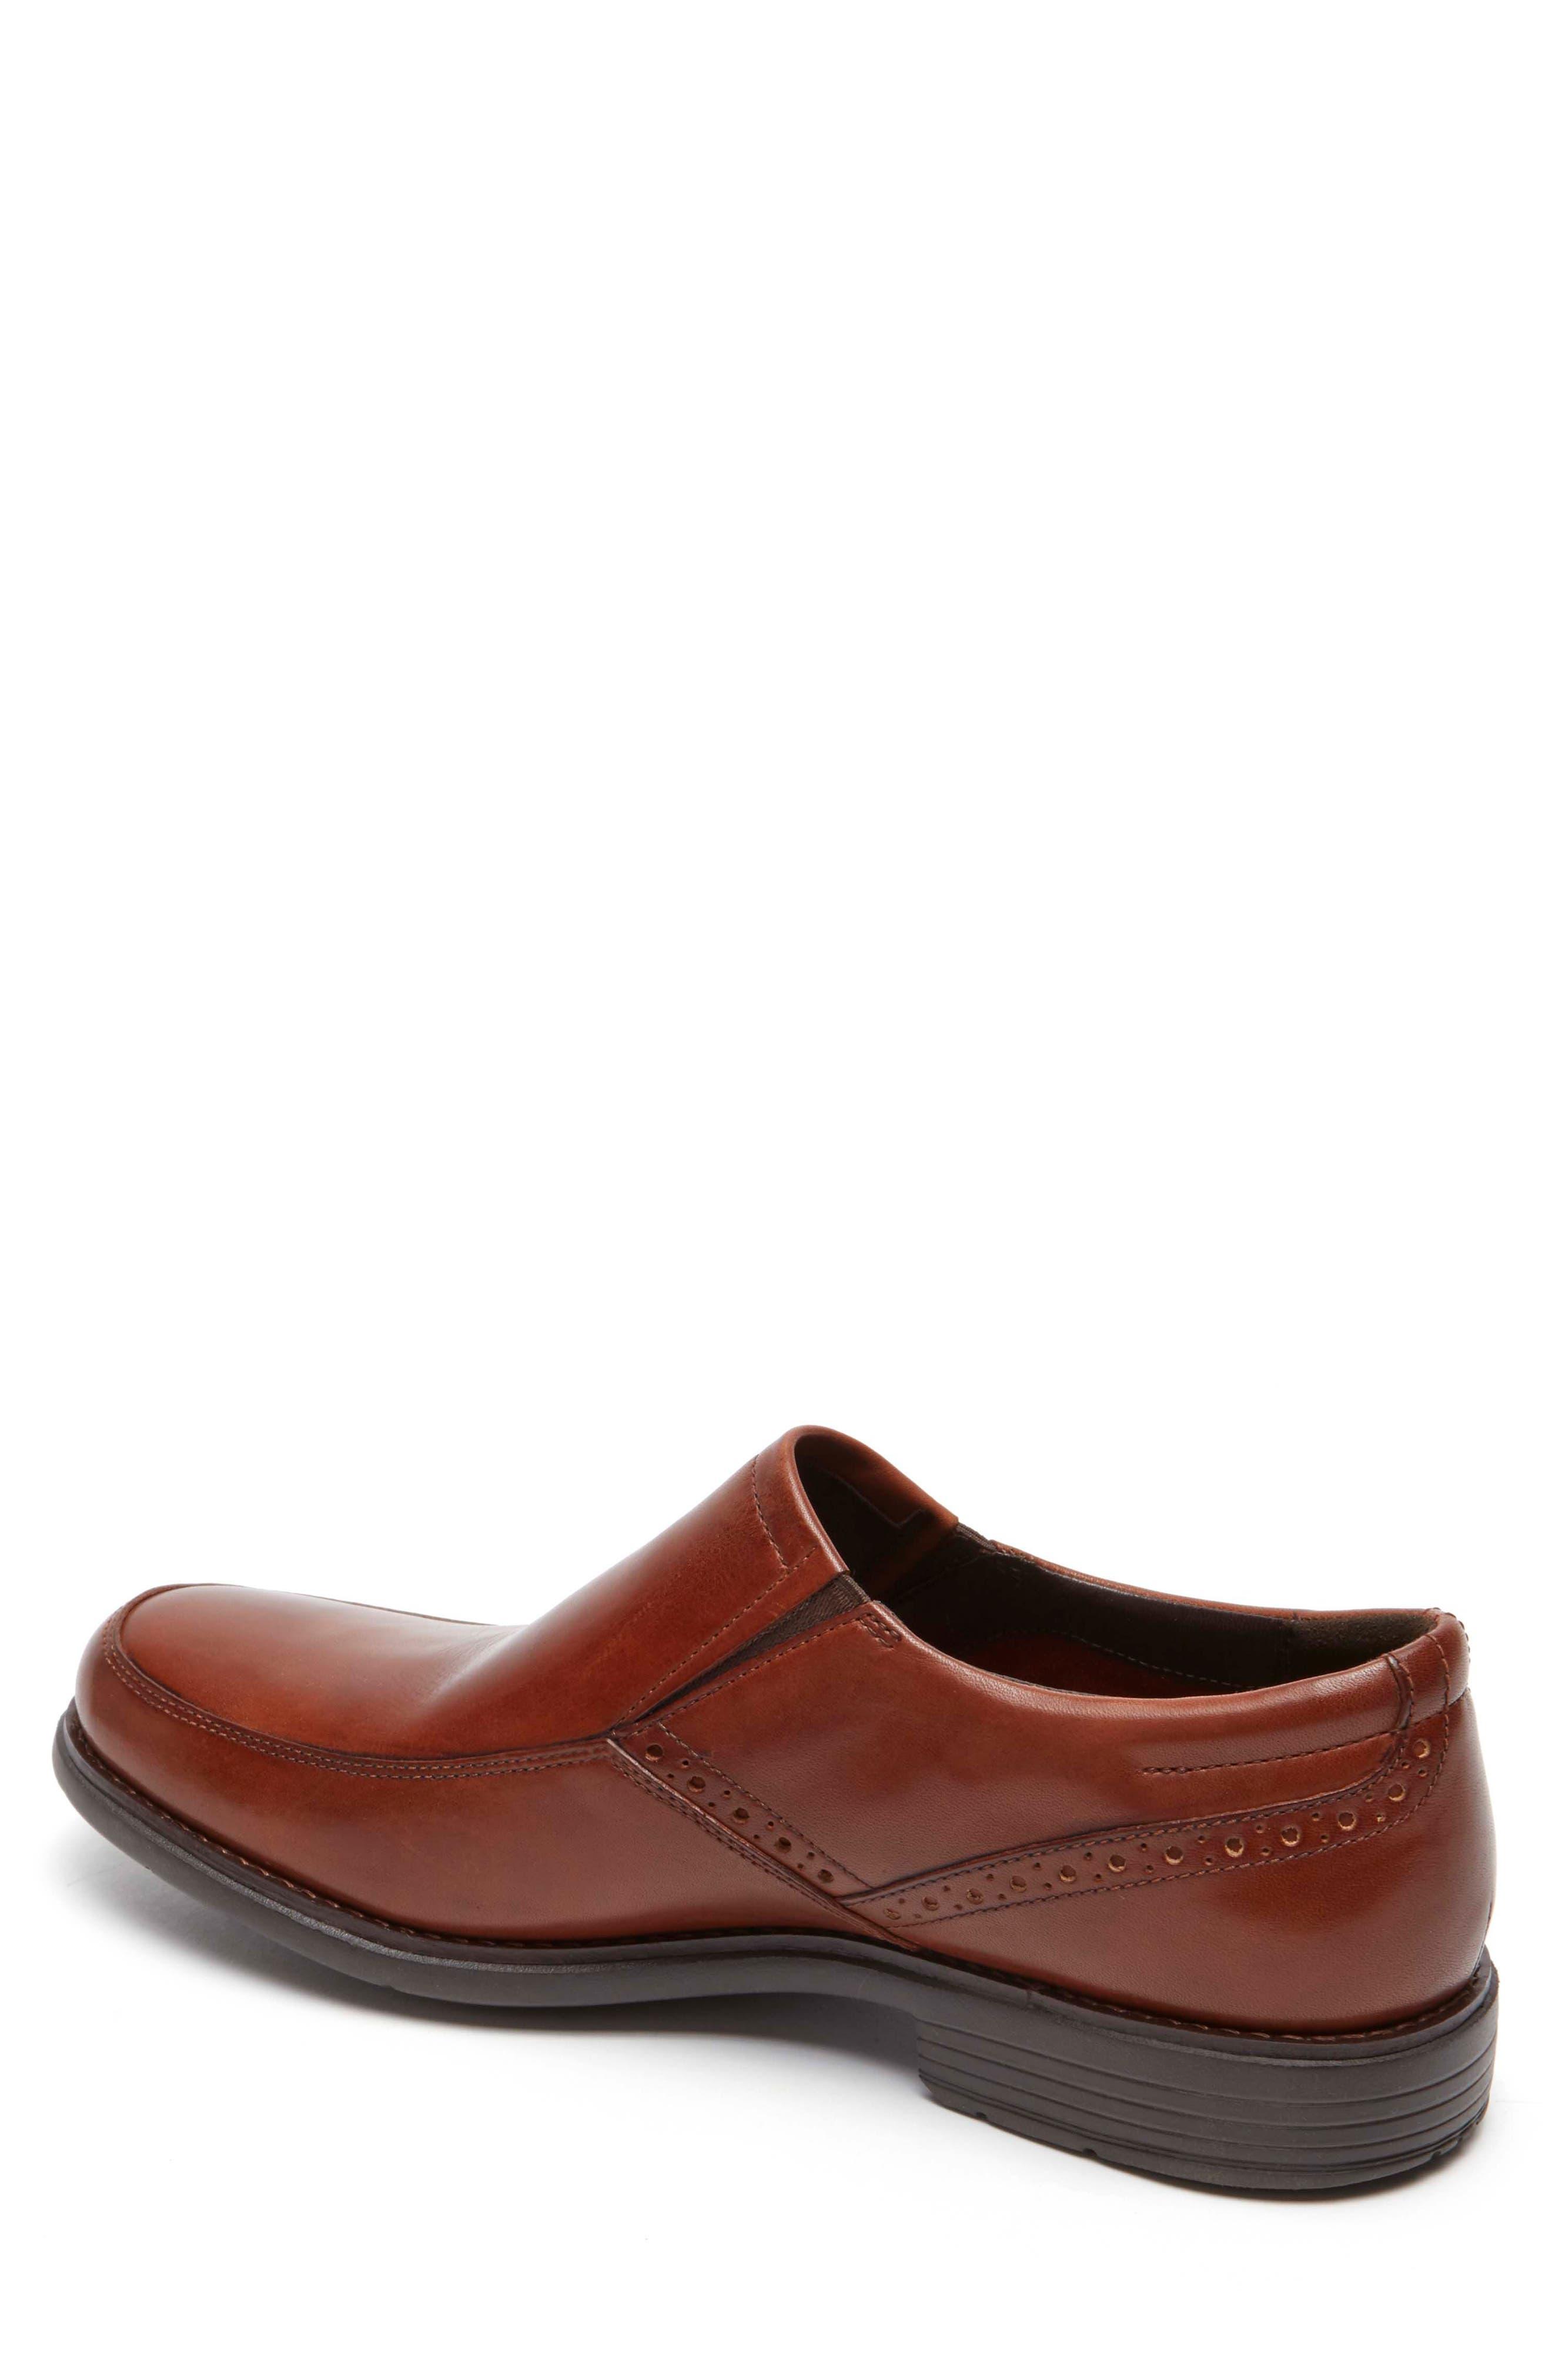 Total Motion Classic Dress Venetian Loafer,                             Alternate thumbnail 2, color,                             Tan Leather